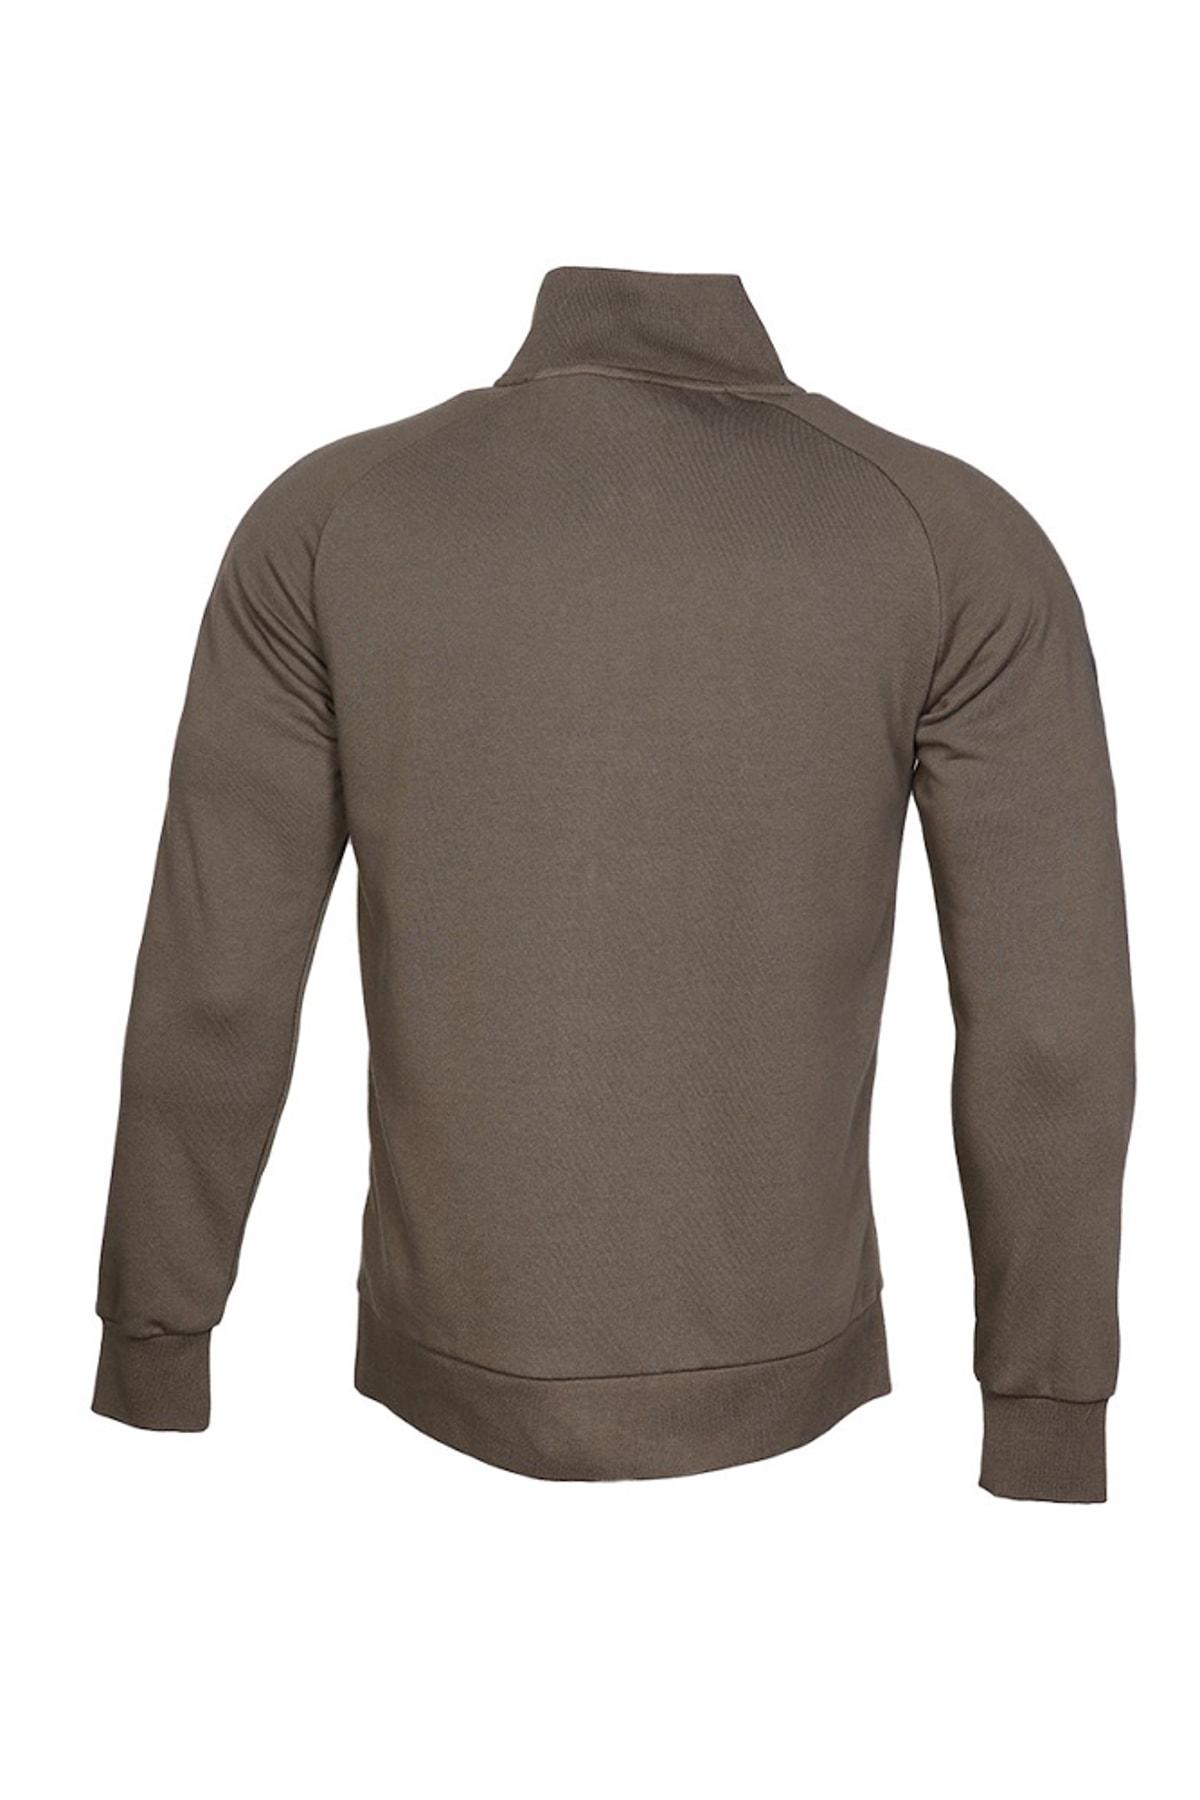 HUMMEL Erkek Zip Ceket Brillo 920594-6119